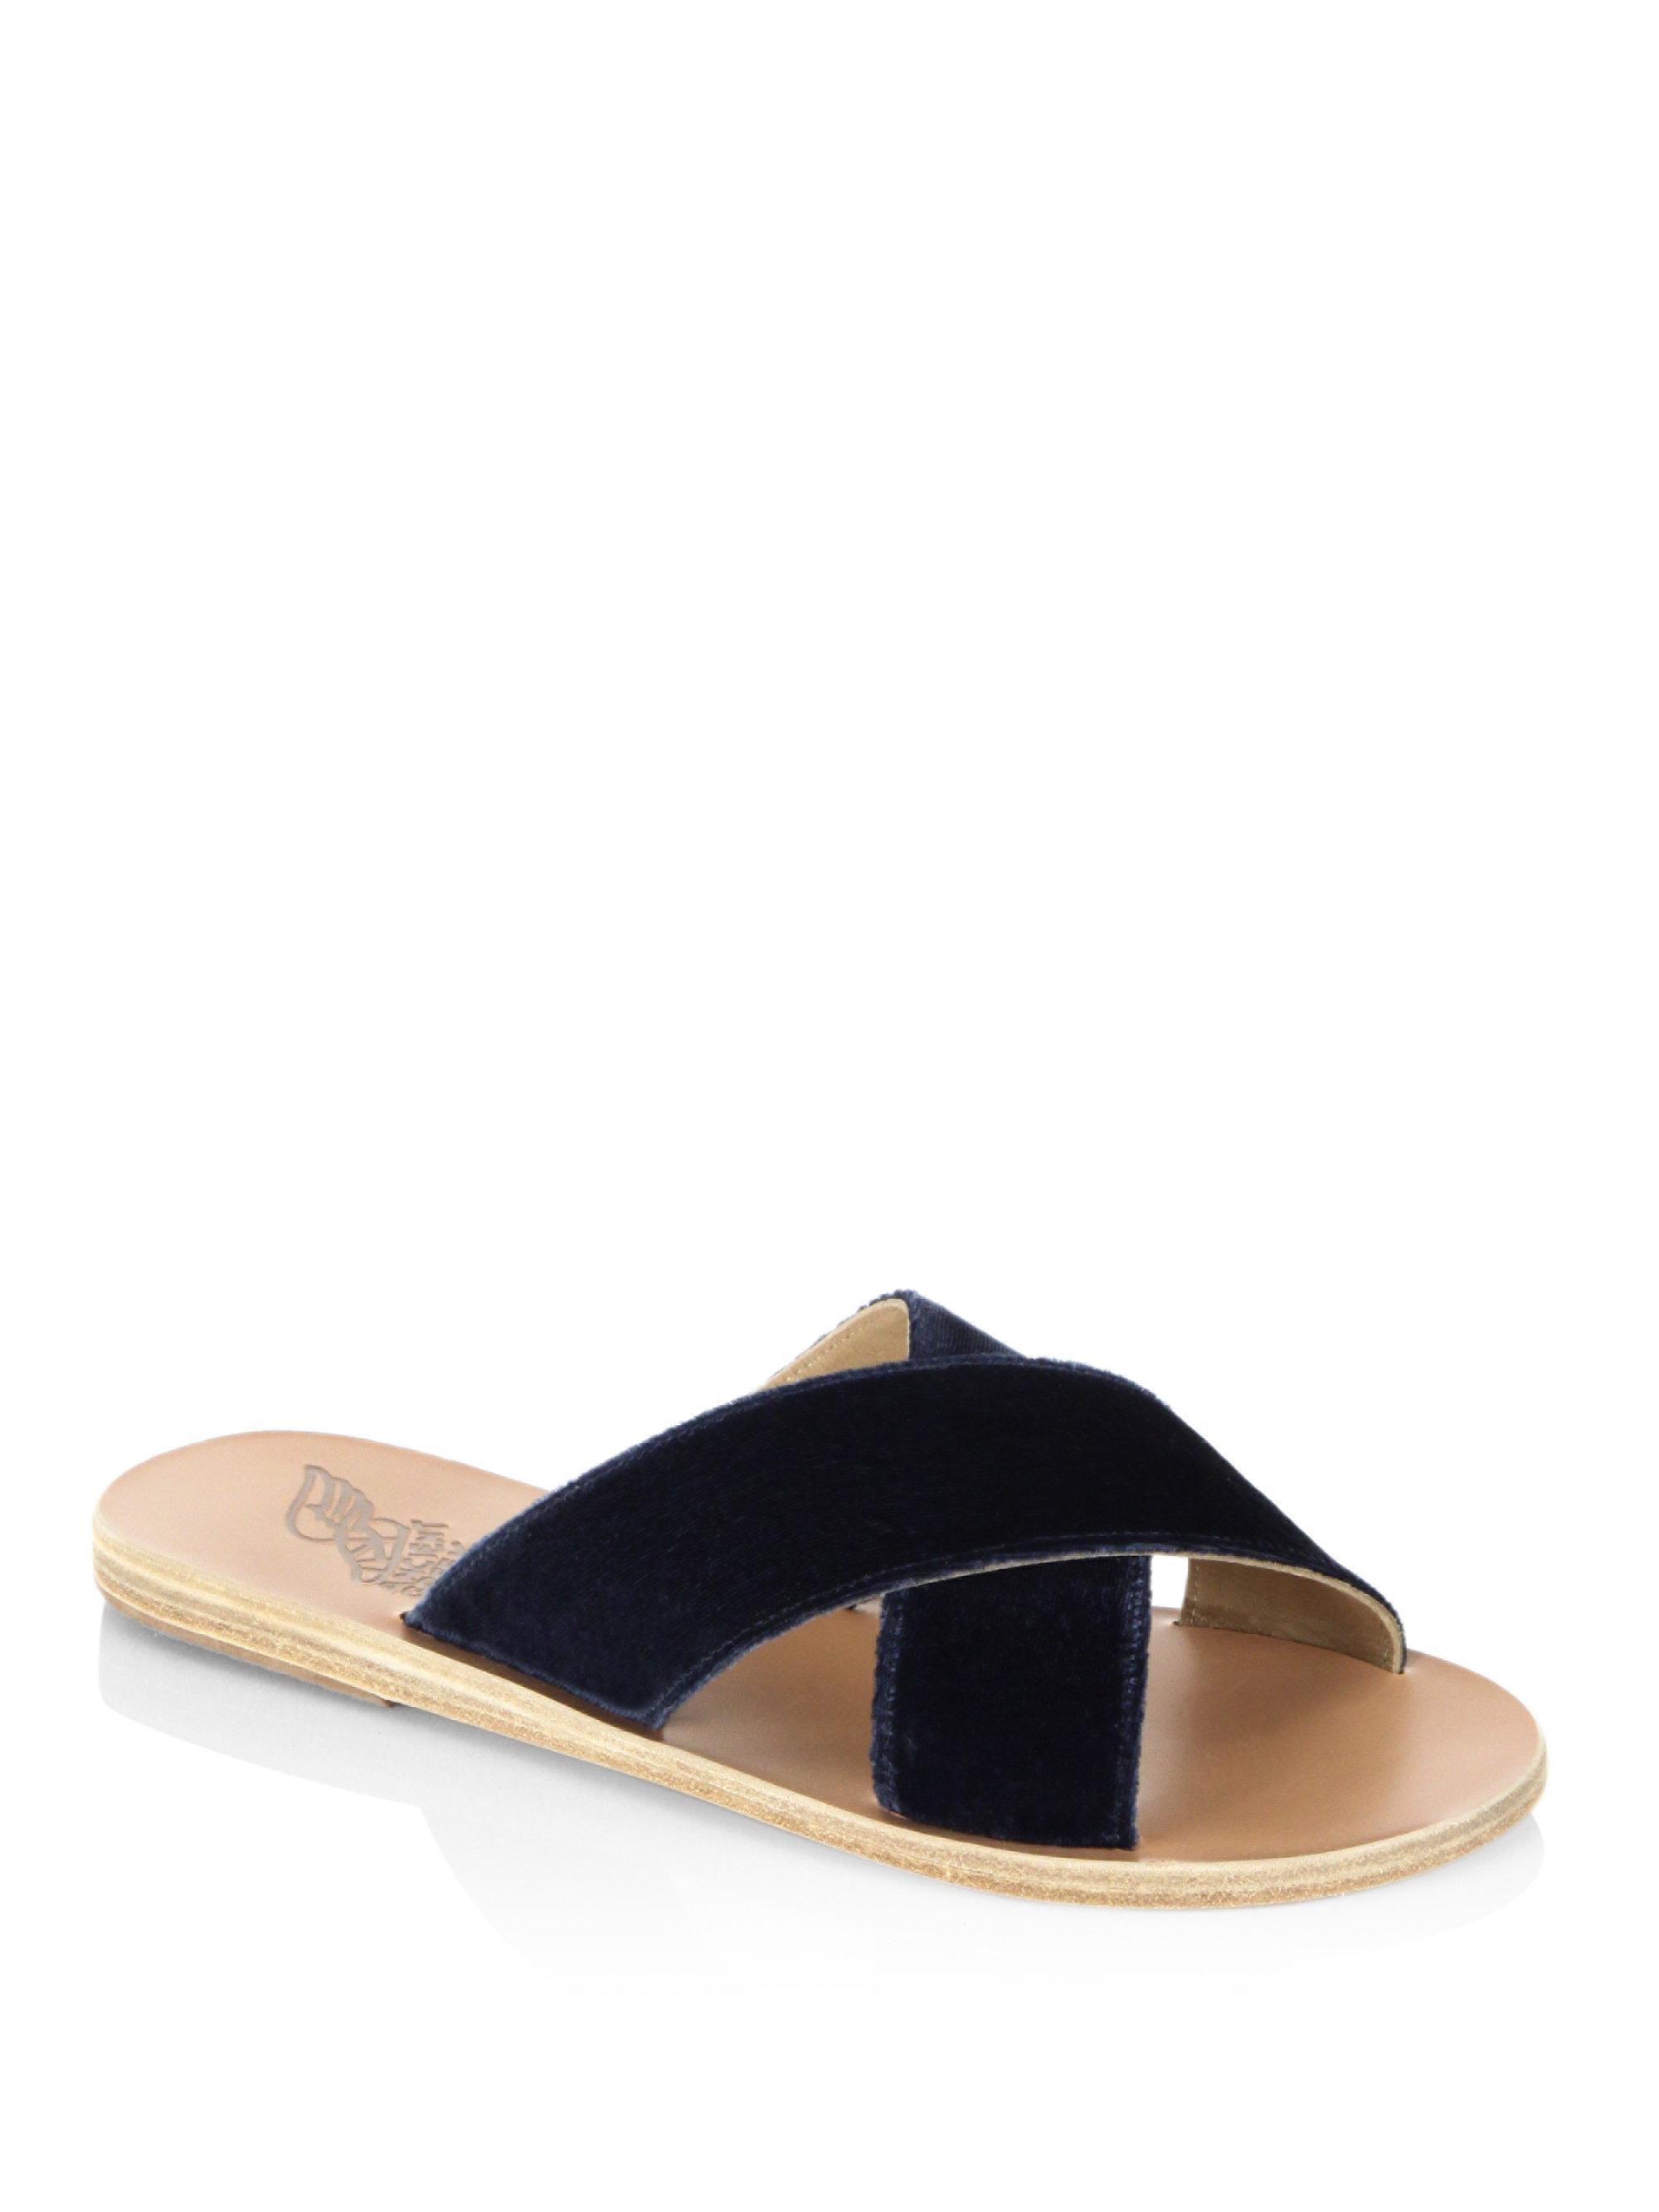 Thais sequined leather slides Ancient Greek Sandals hlTI92